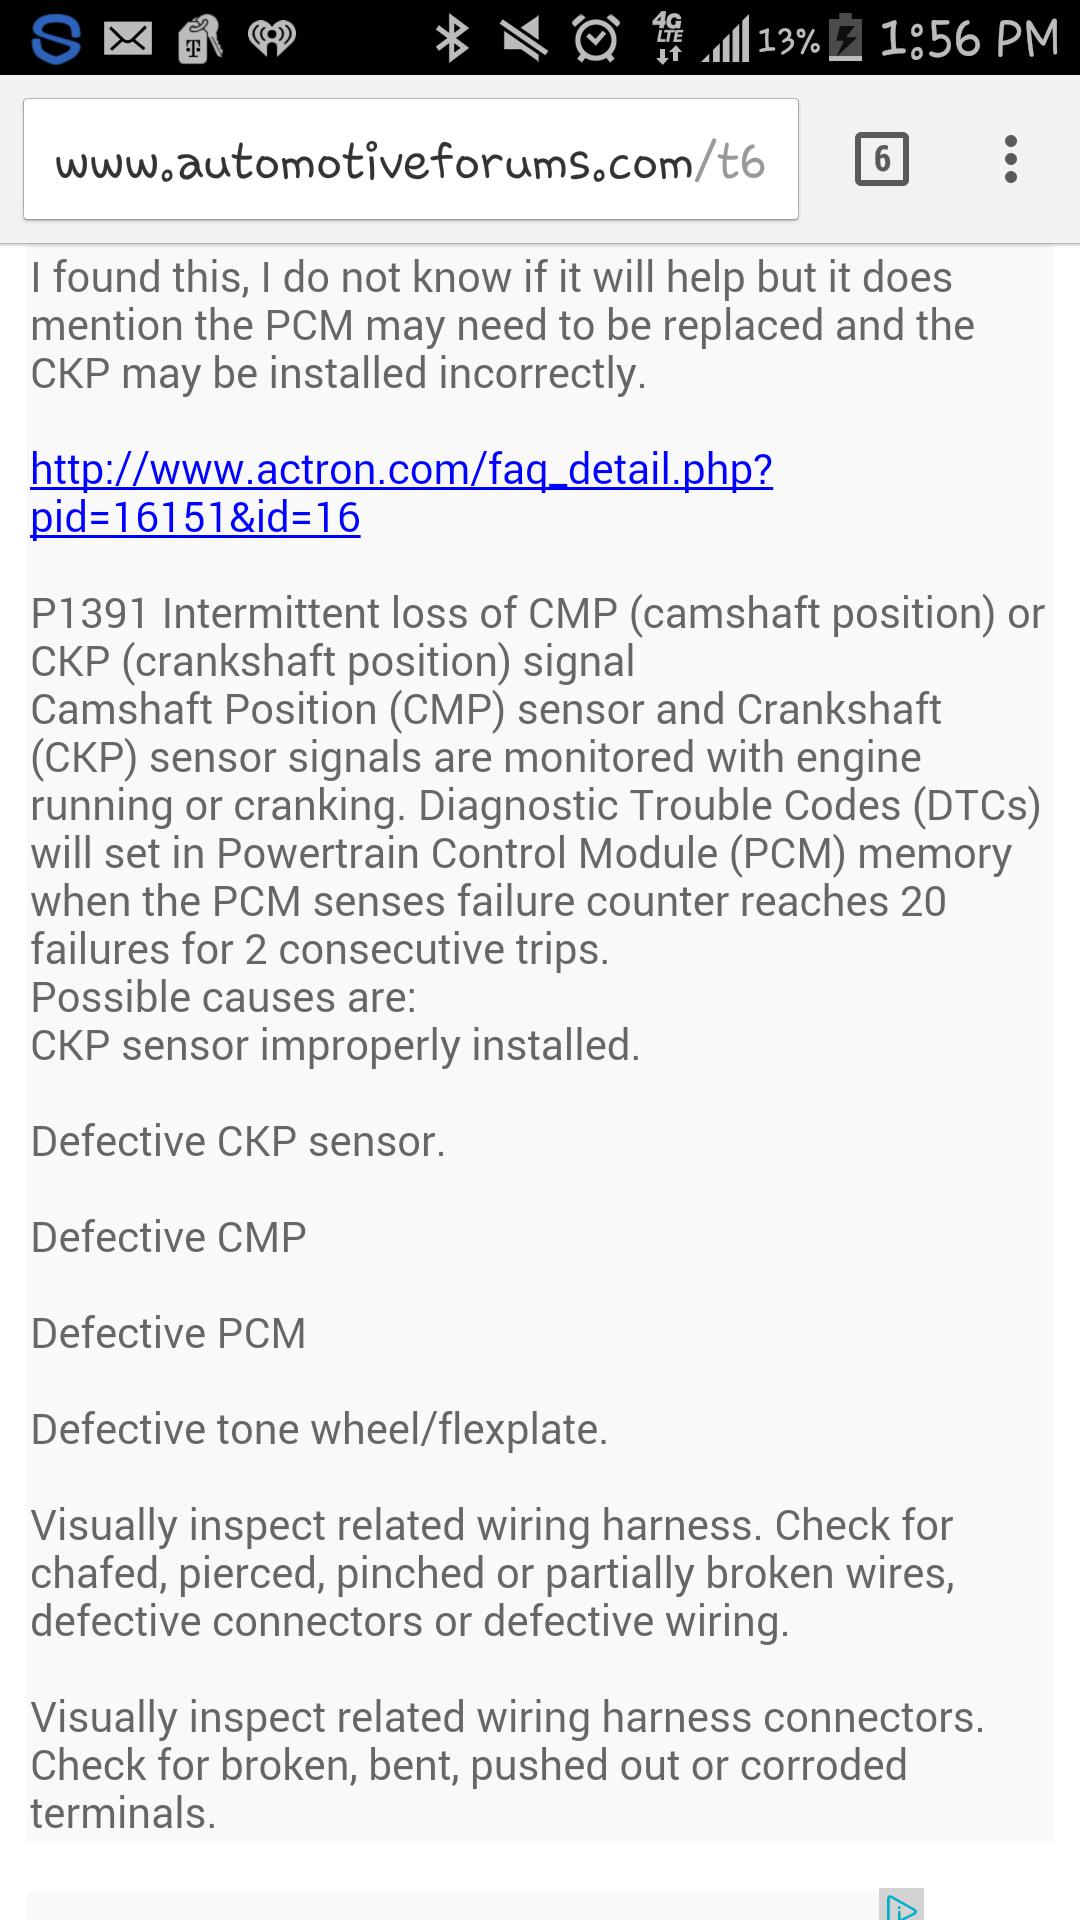 Truck looses rpm and bucks/jerks on acceleration | DodgeTalk